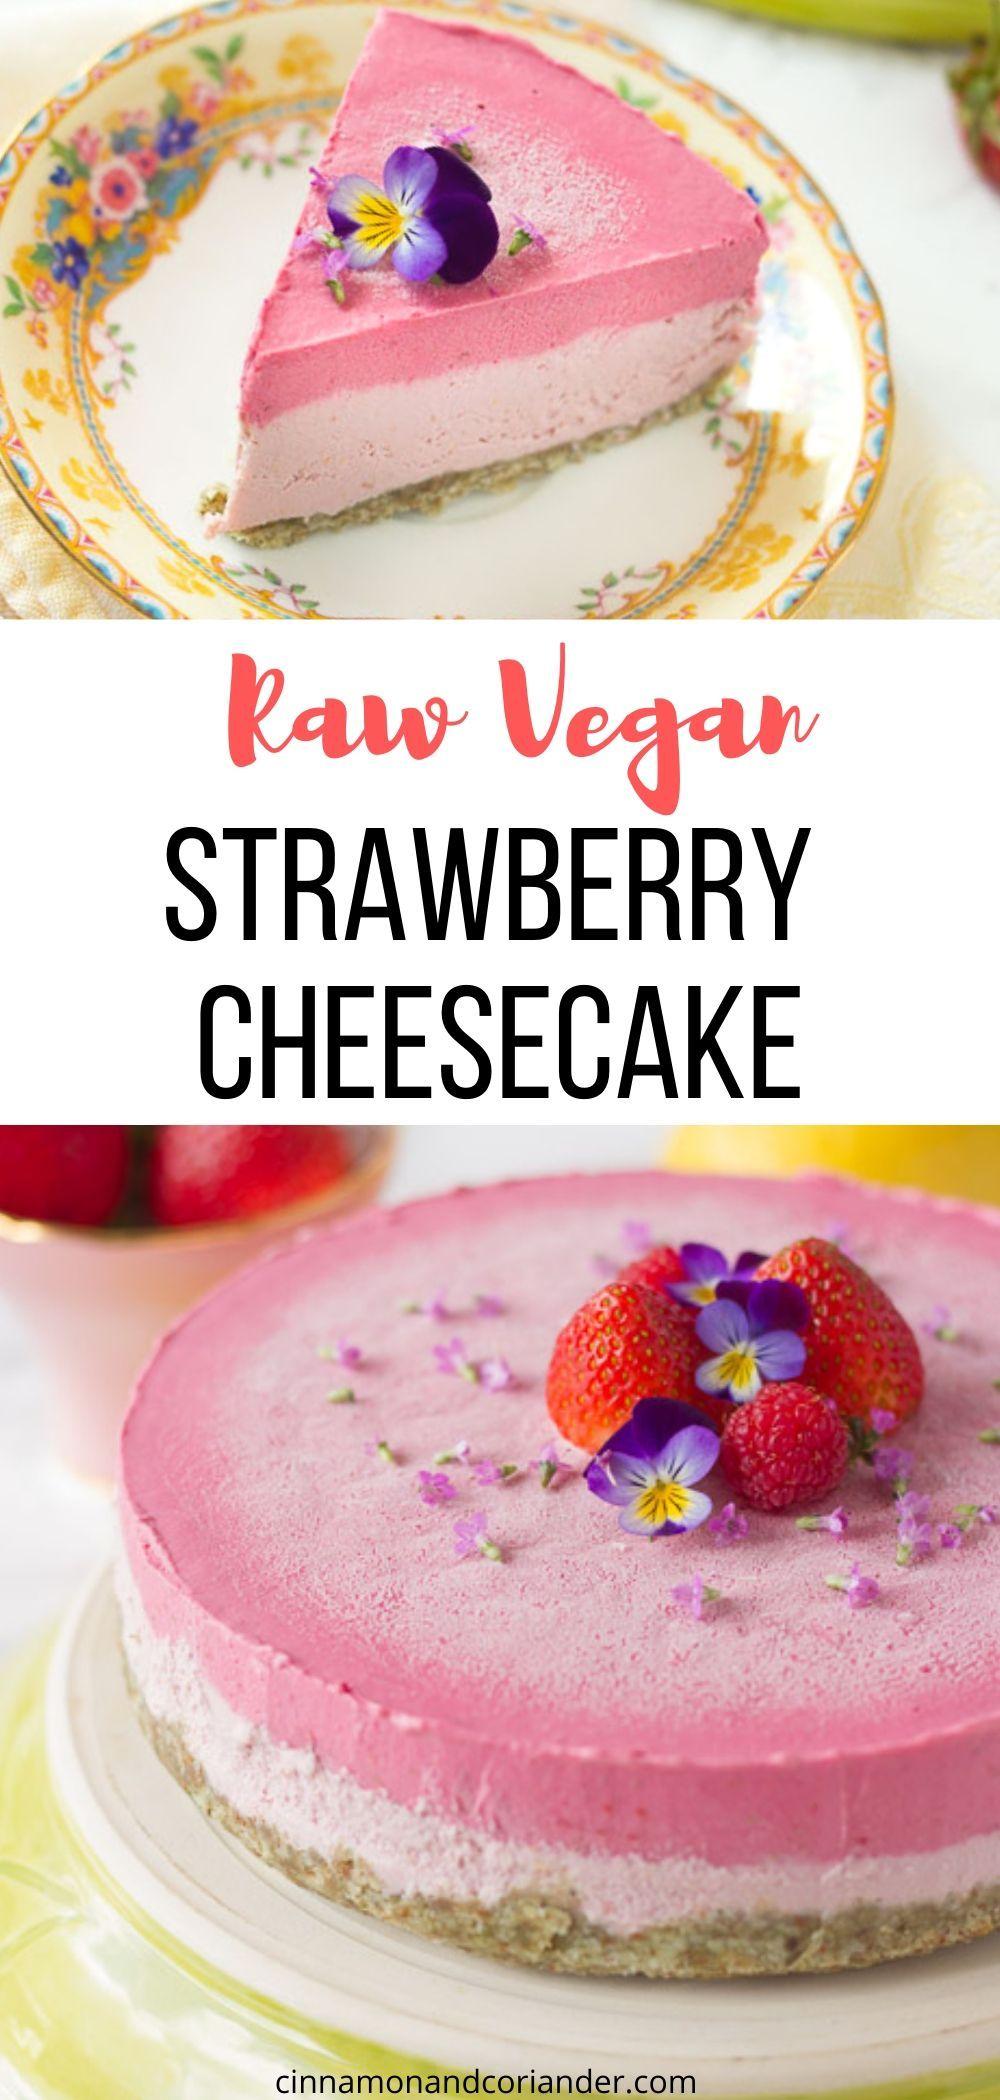 Raw Mint Cheesecake With Strawberries Raw Vegan Desserts Raw Desserts Mint Cheesecake